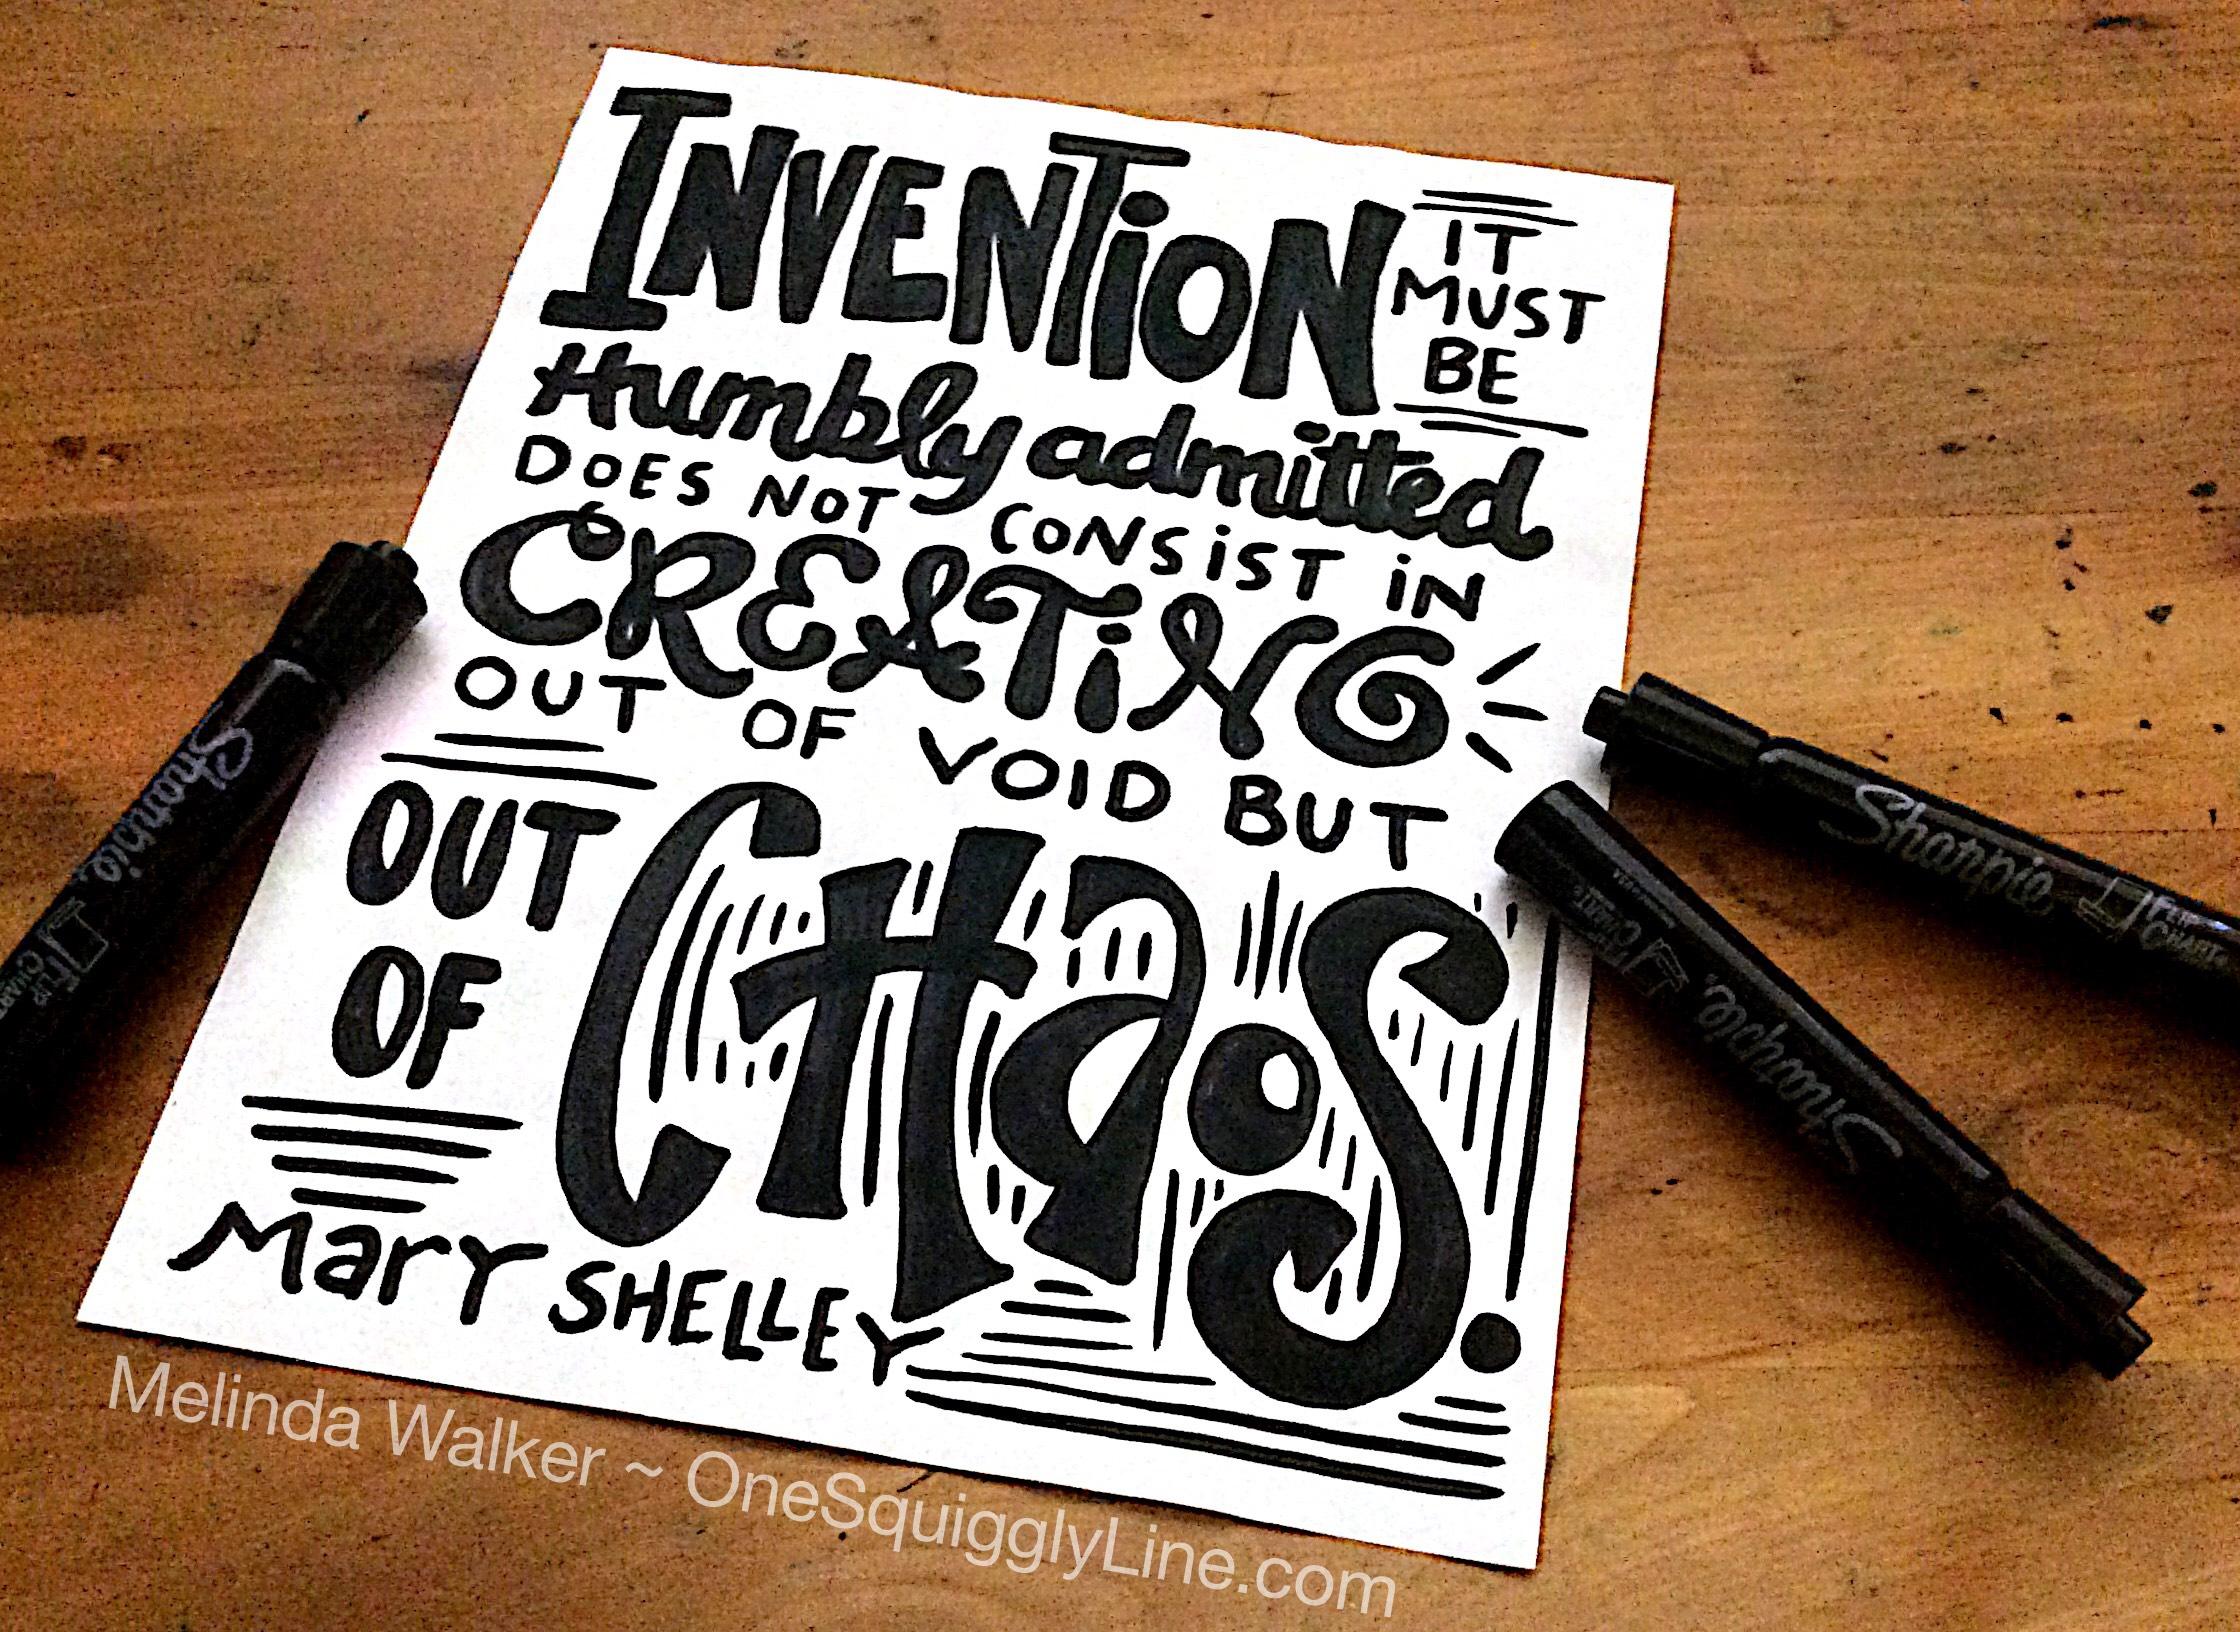 VisualThinking_Lettering_Quote_MaryShelley_InventionChaos_MelindaWalker_OneSquigglyLine